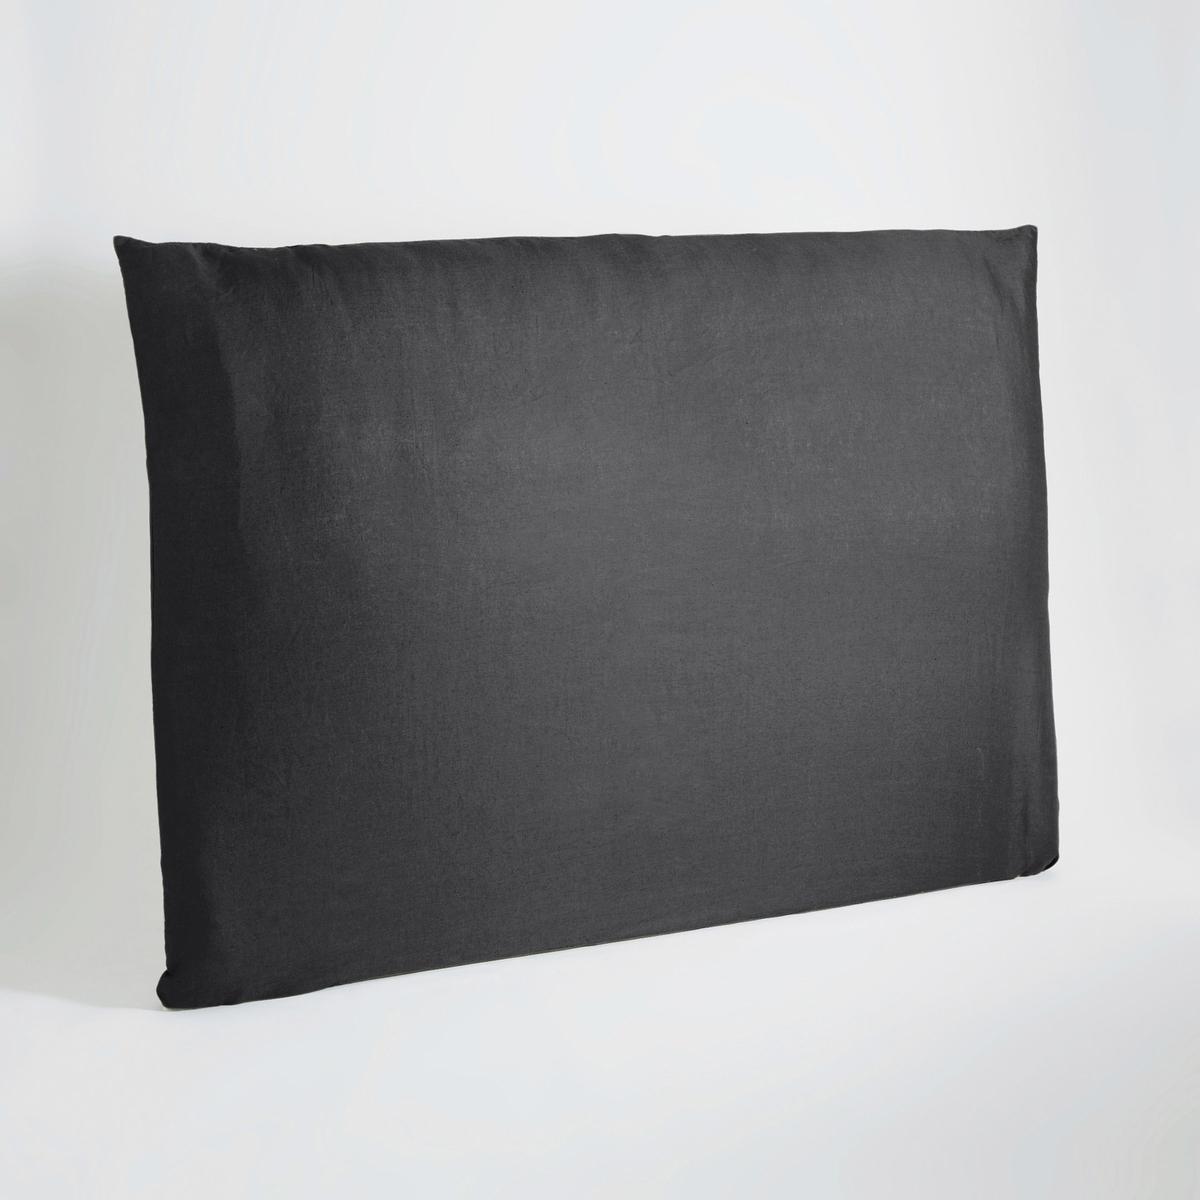 Чехол La Redoute На изголовье кровати из осветленного льна Mereson 160 см серый